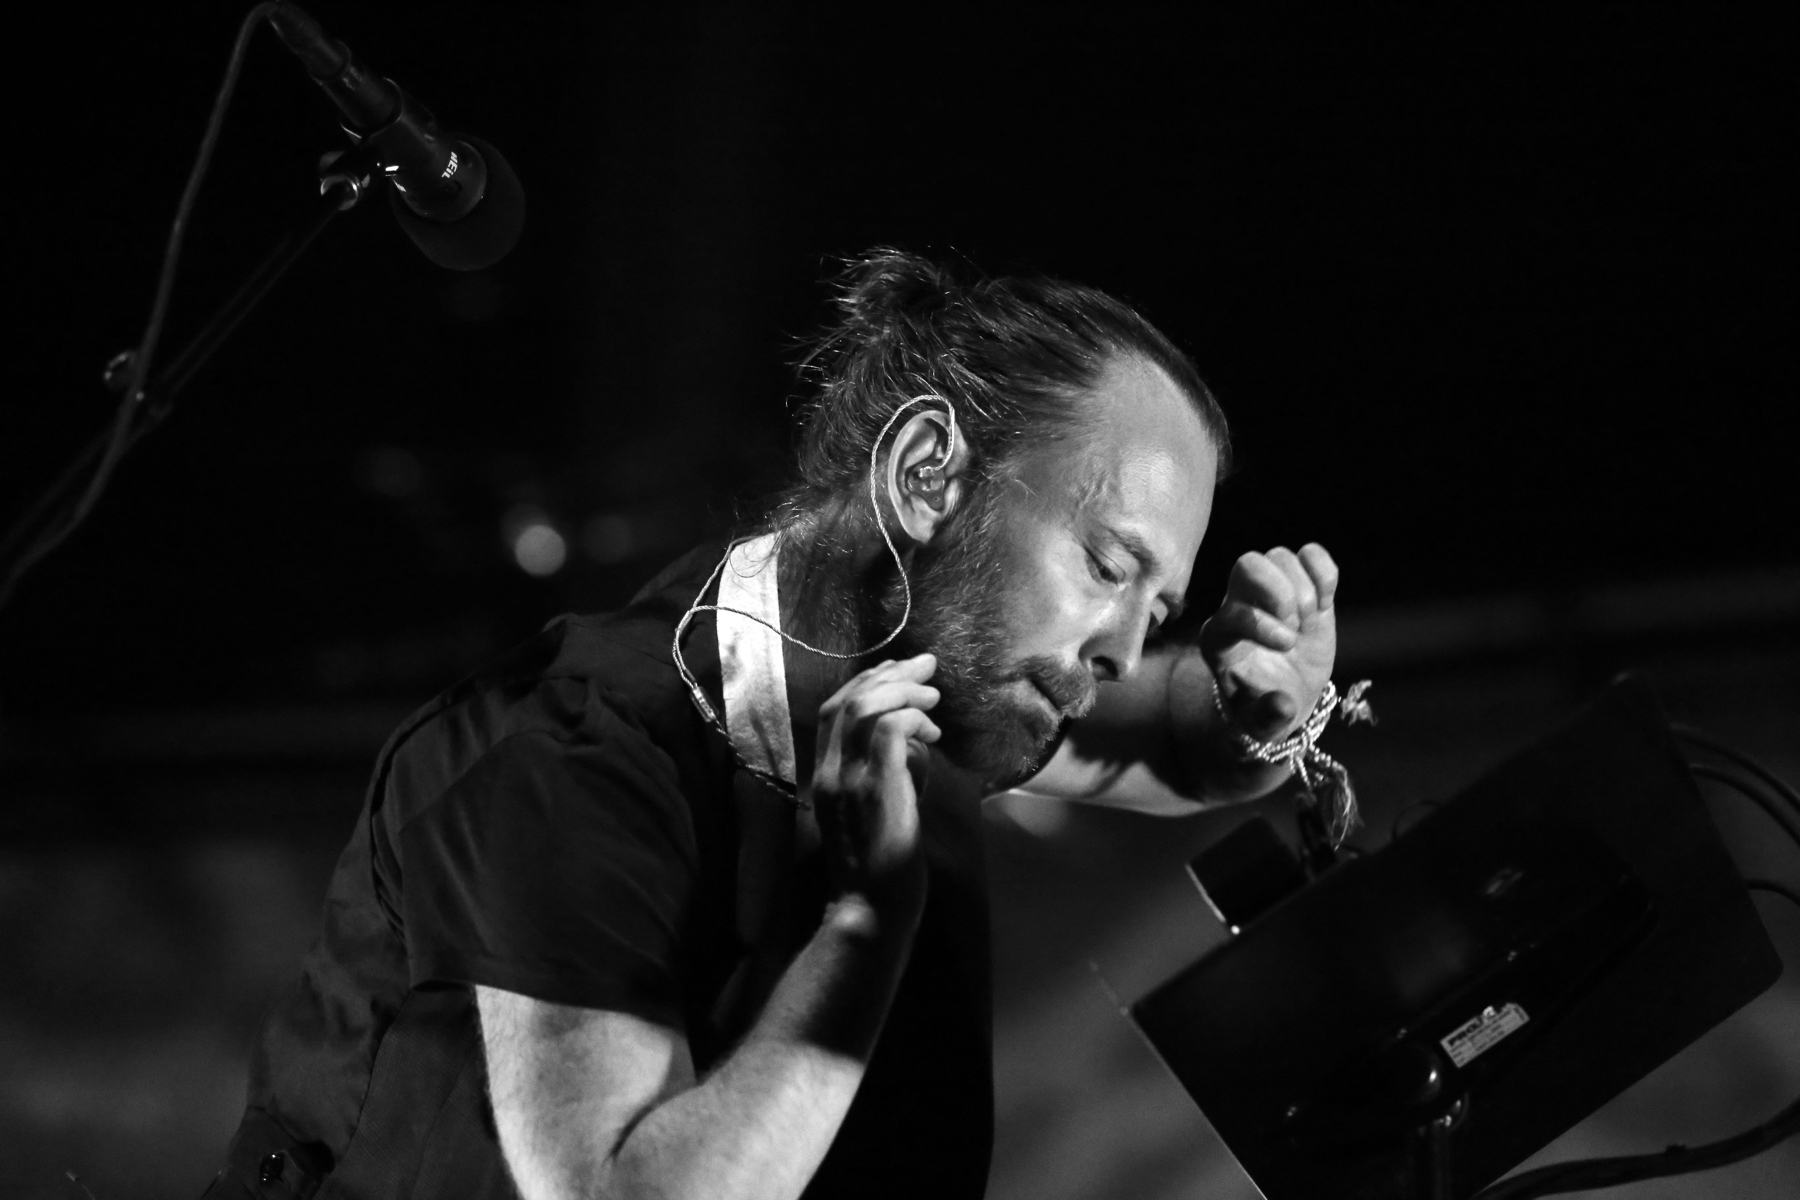 Thom Yorke, photo by Killian Young